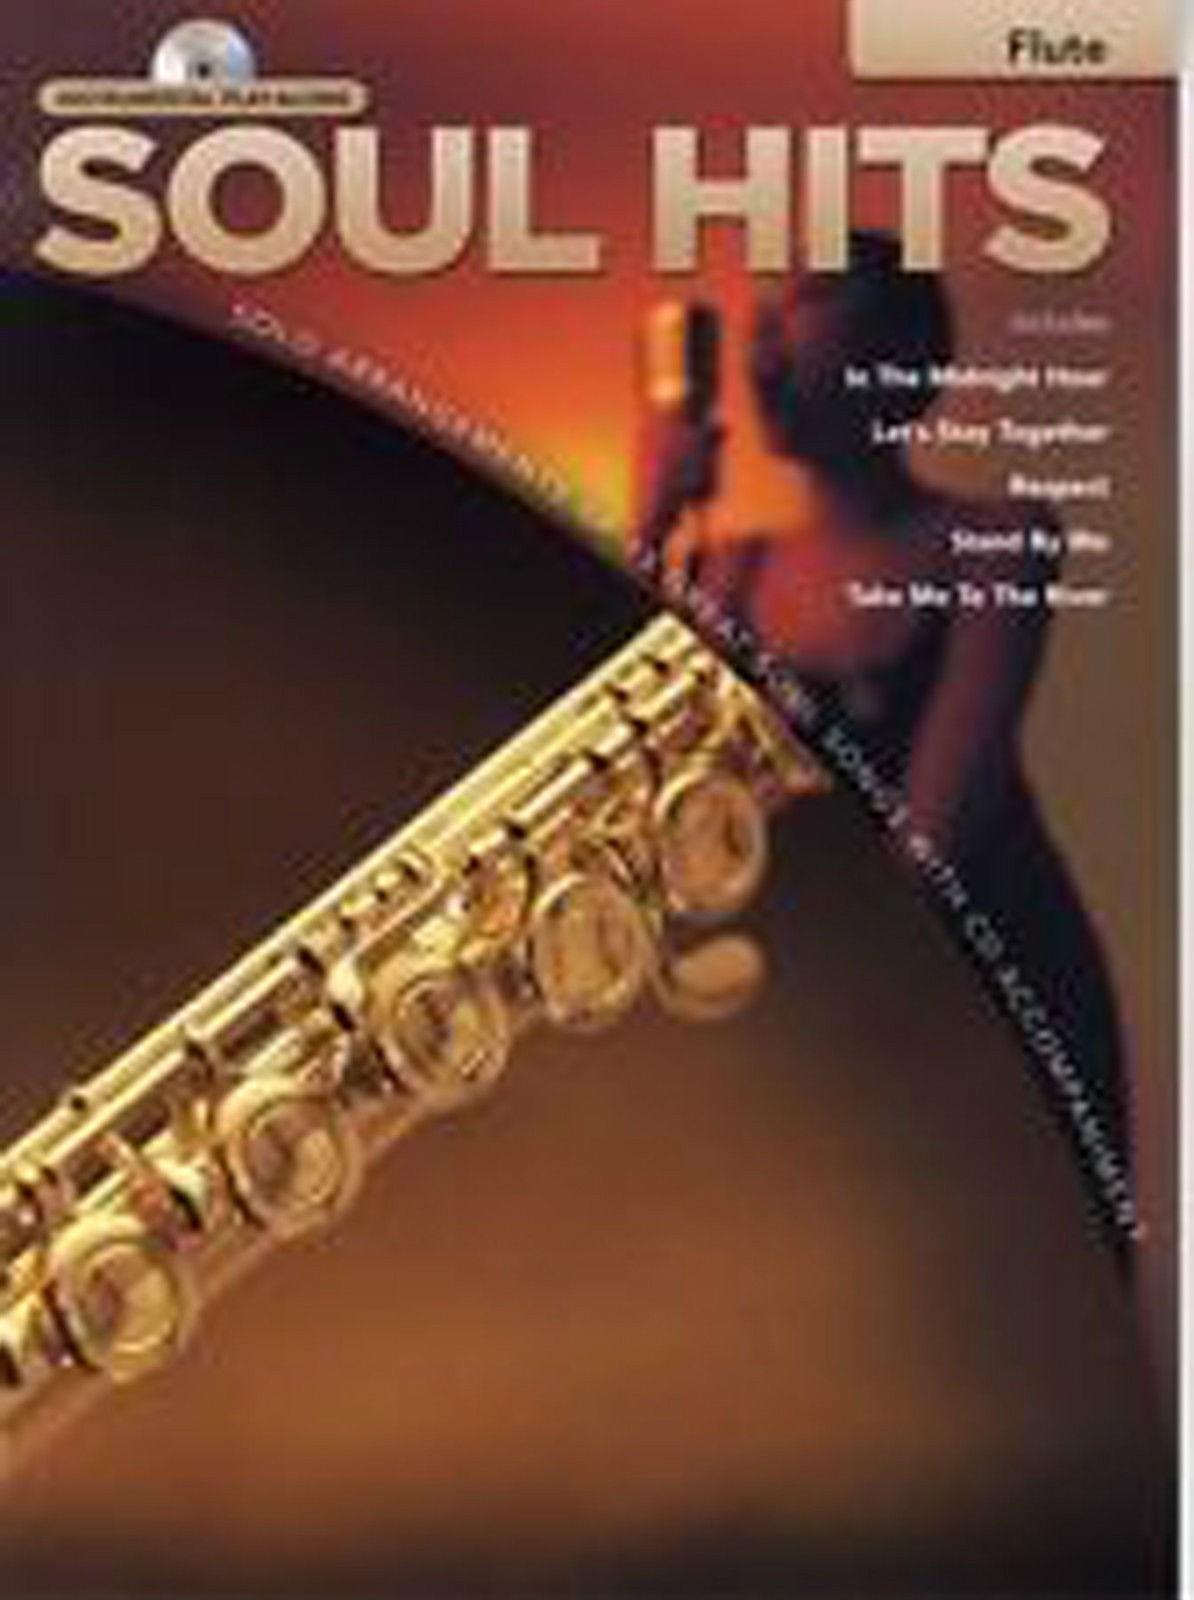 Hal Leonard Instrumental Play-Along Soul Hits Flute Book & CD B42